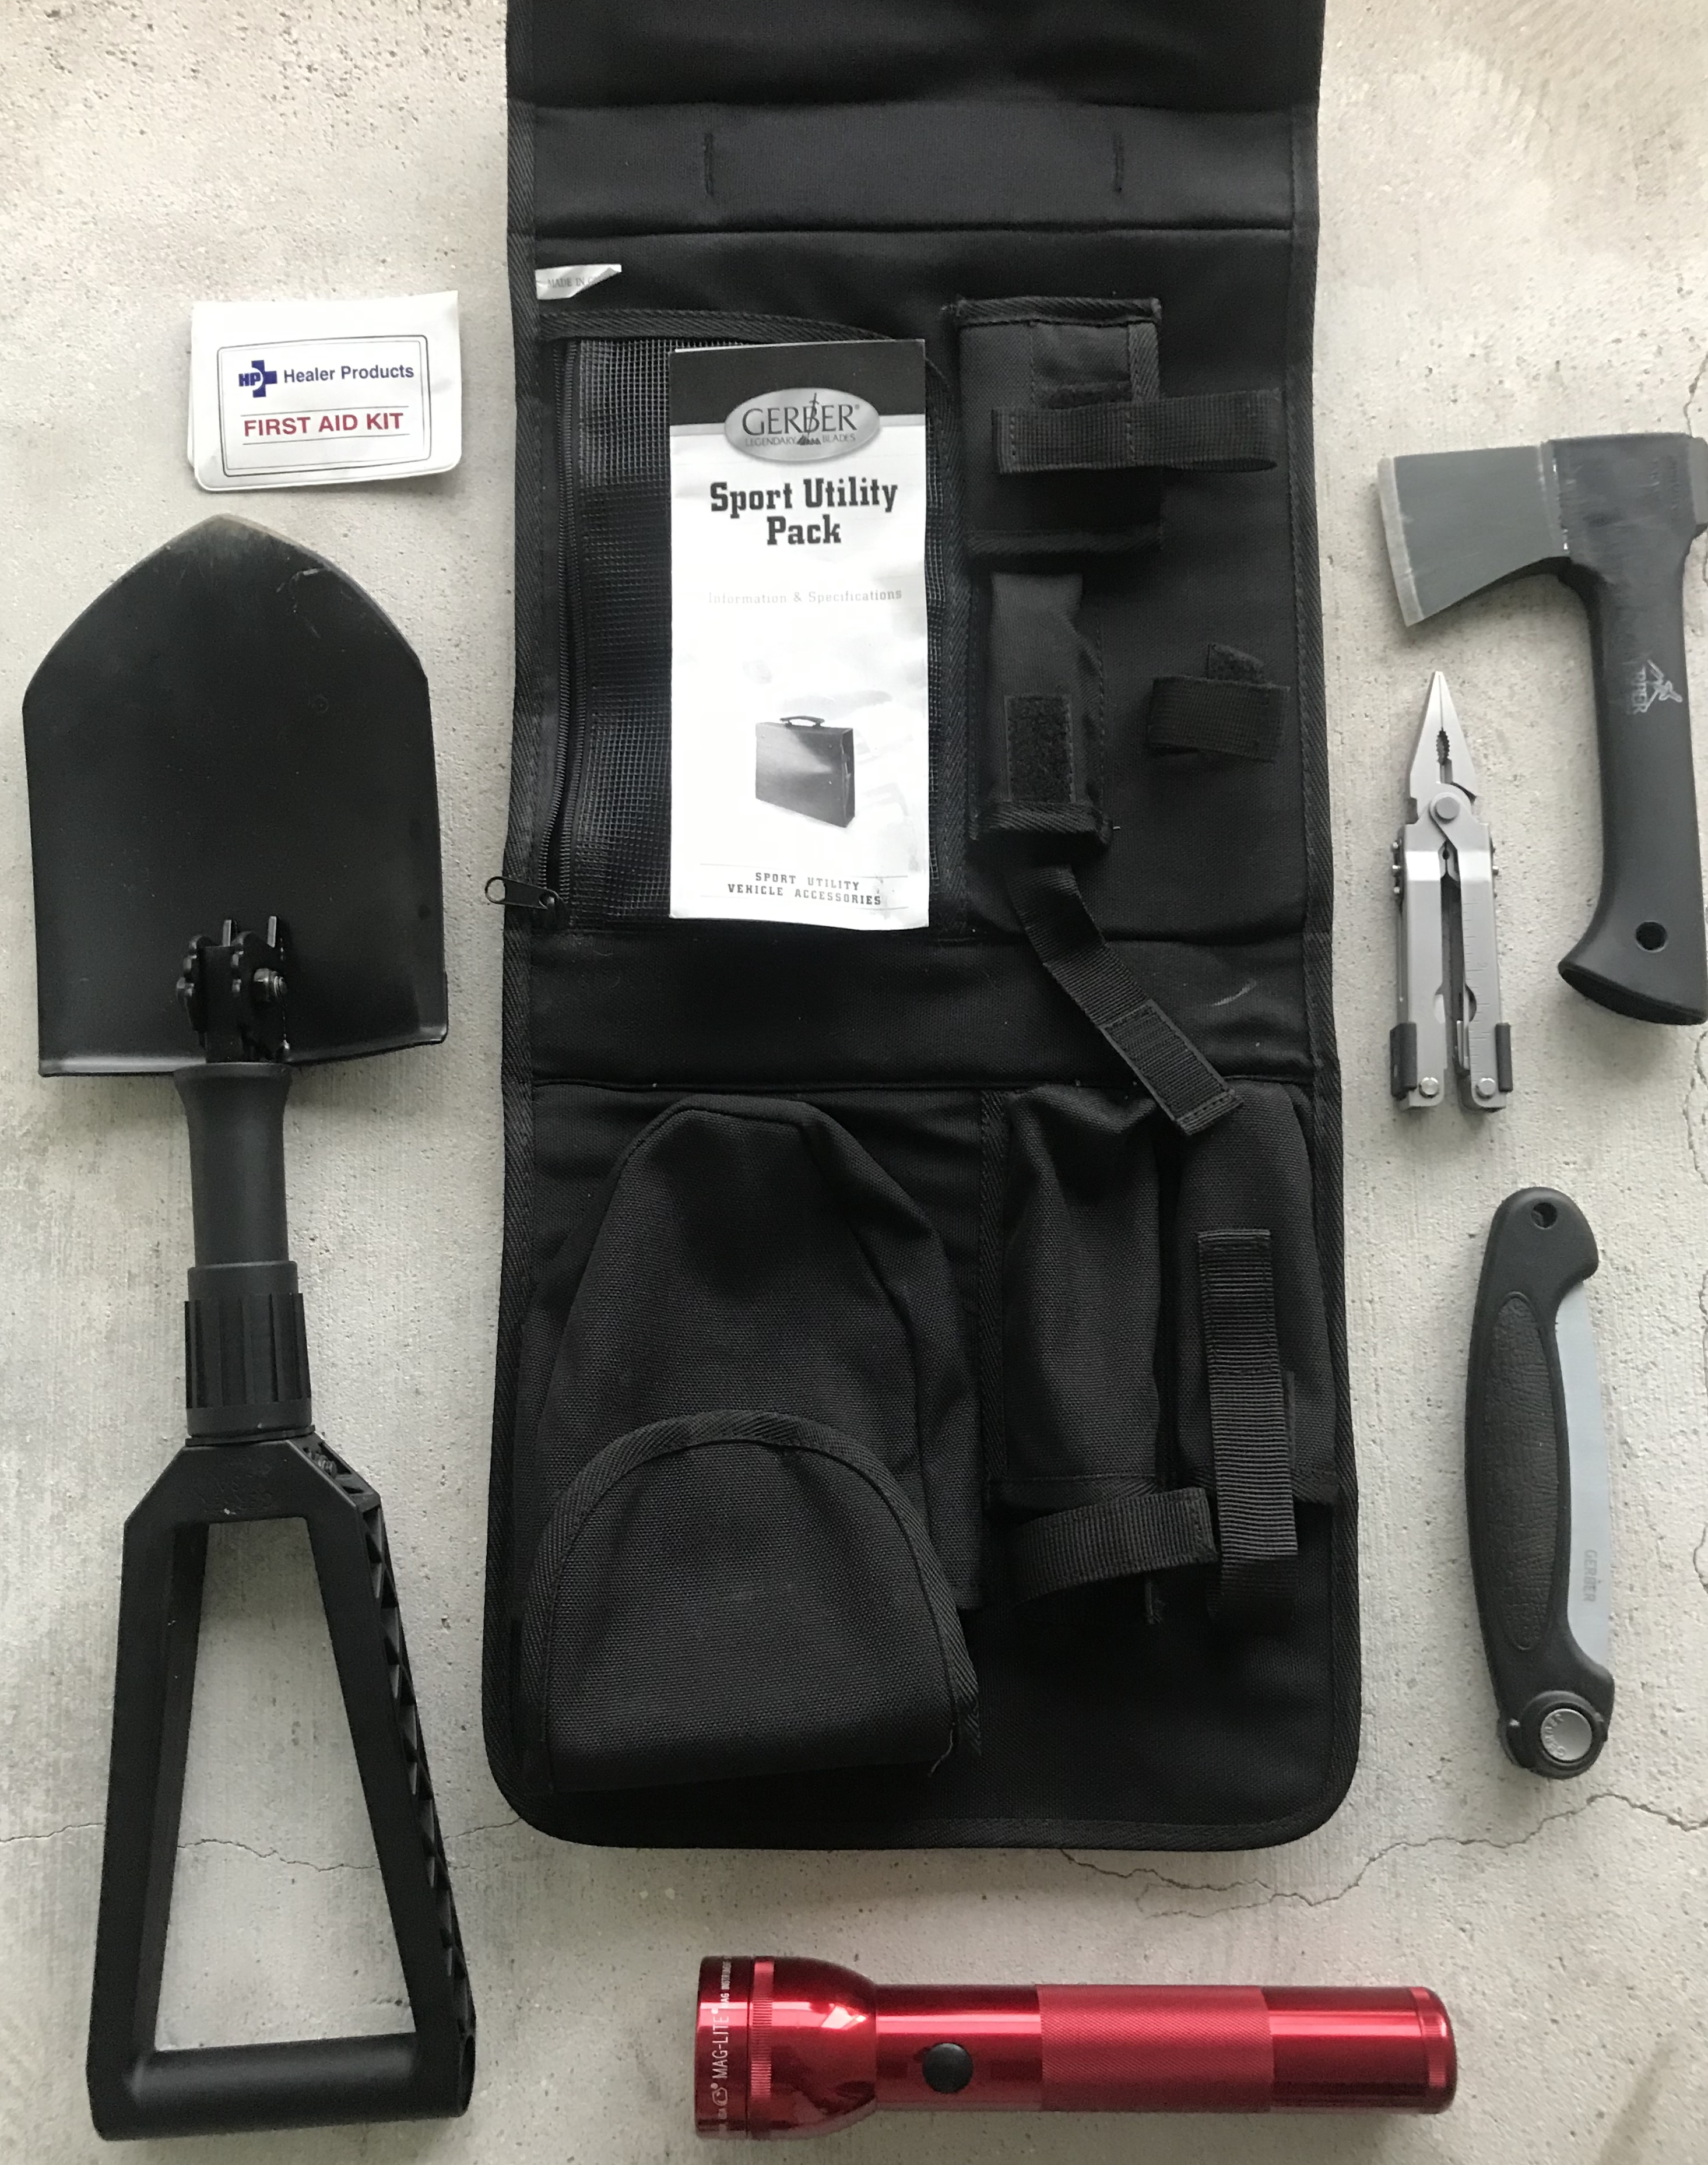 Gerber Sport Utility Pack